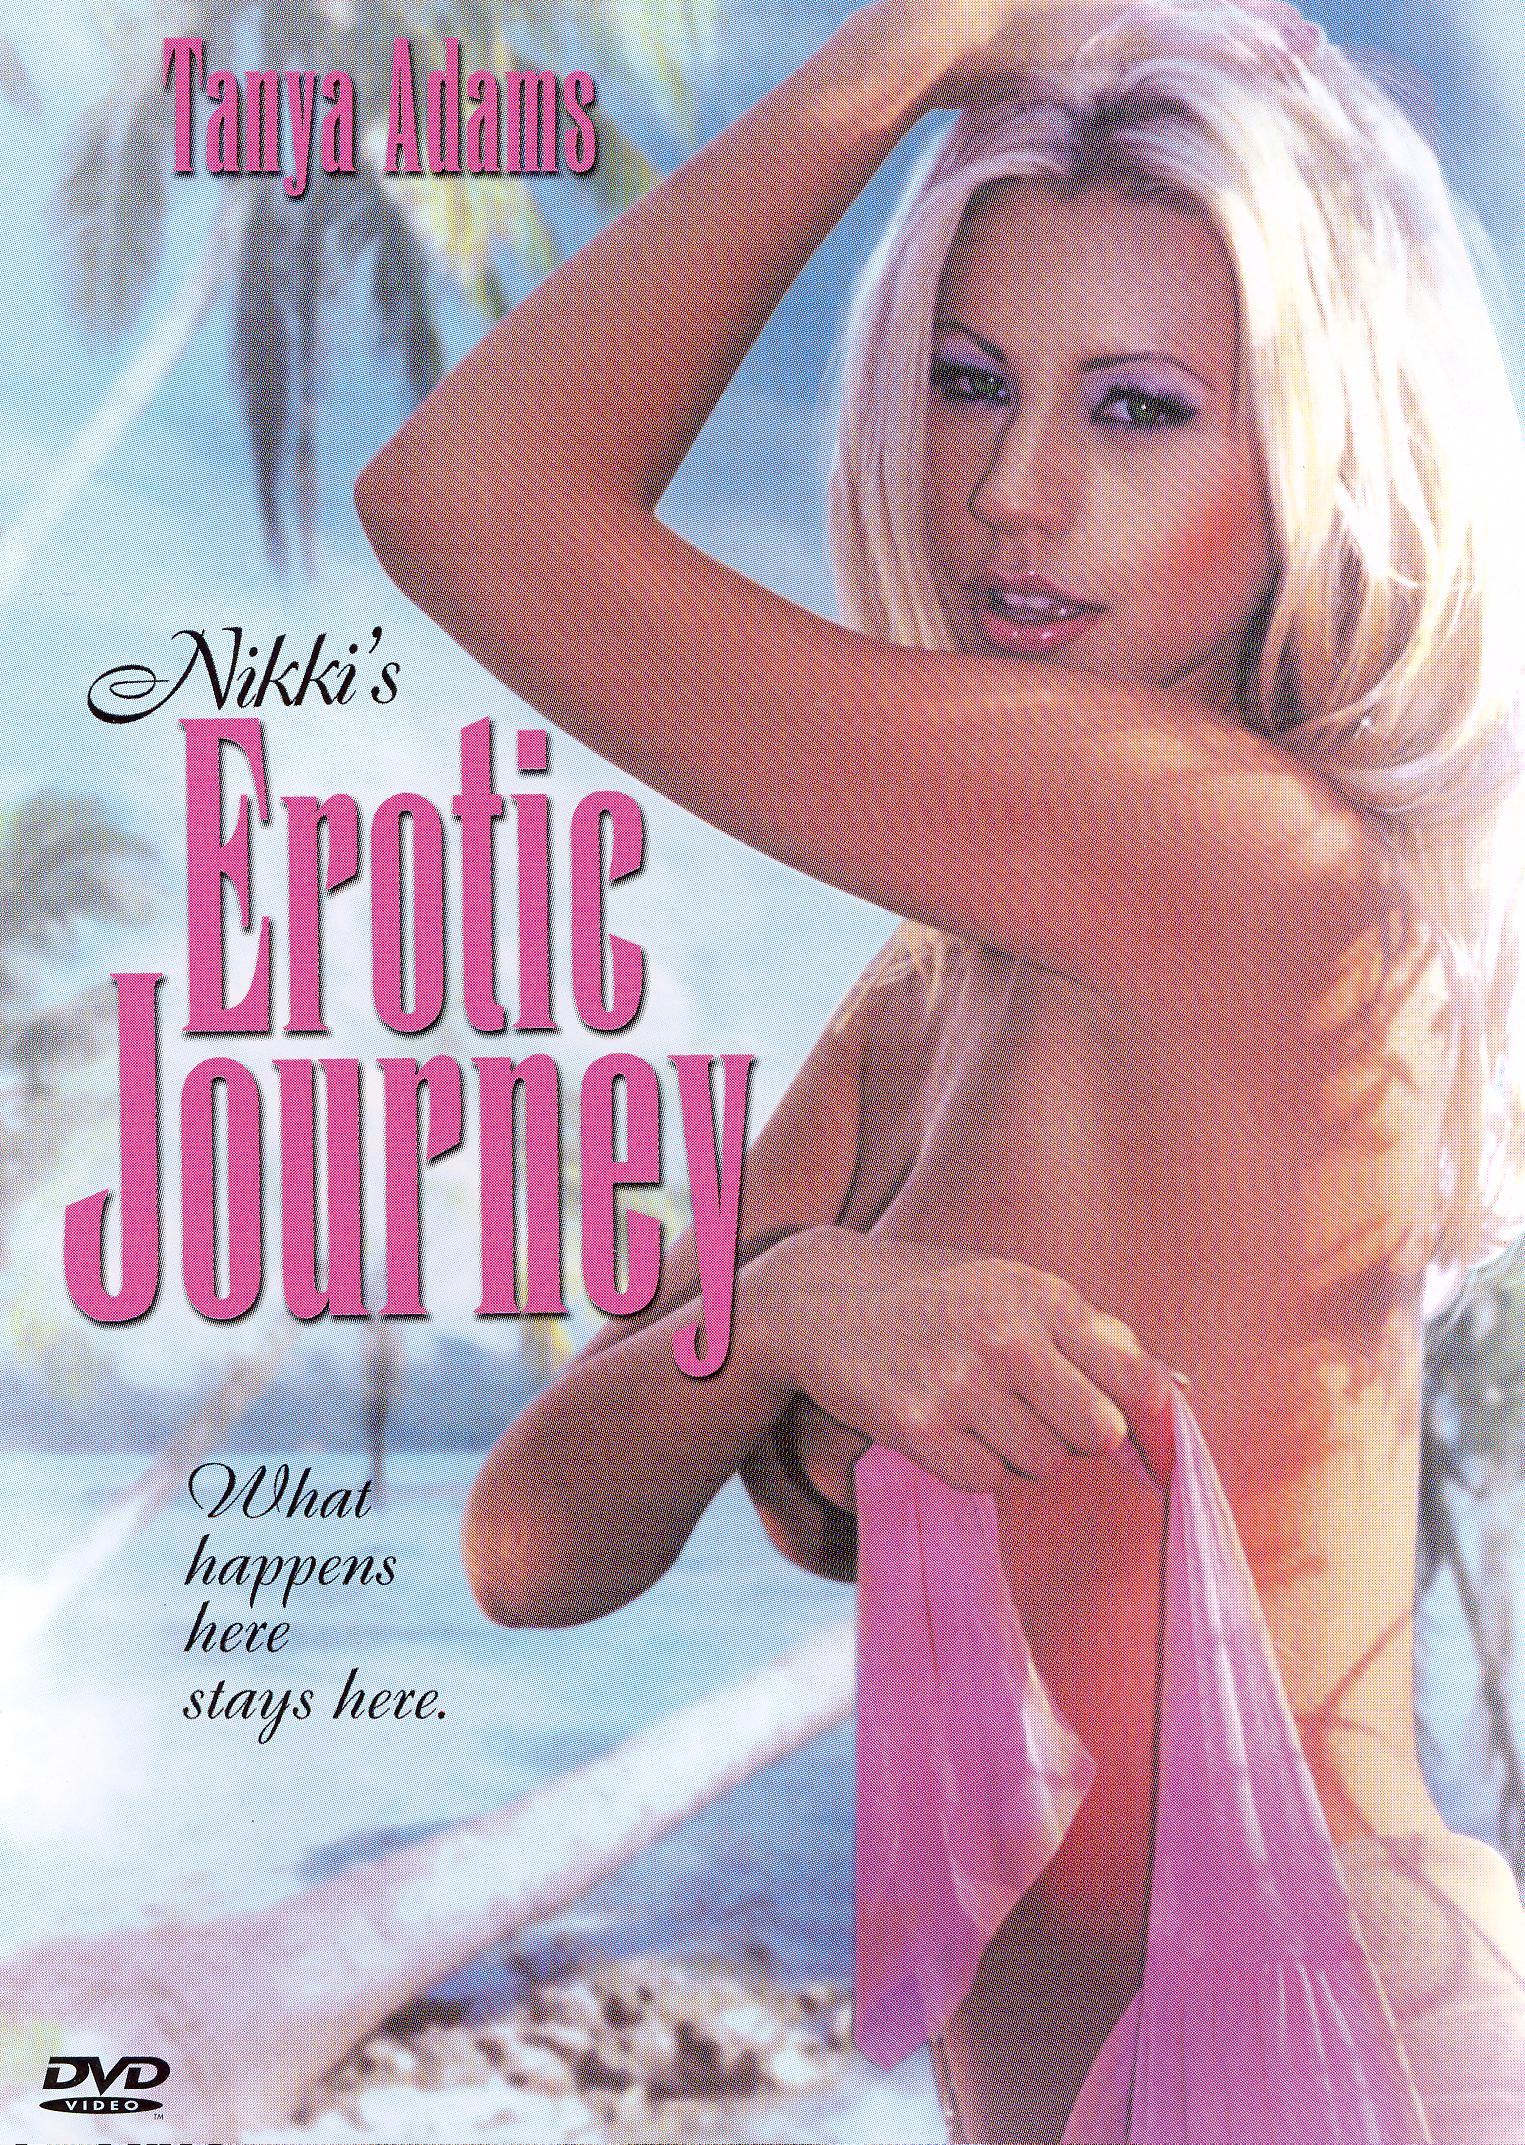 Nikki's Erotic Journey